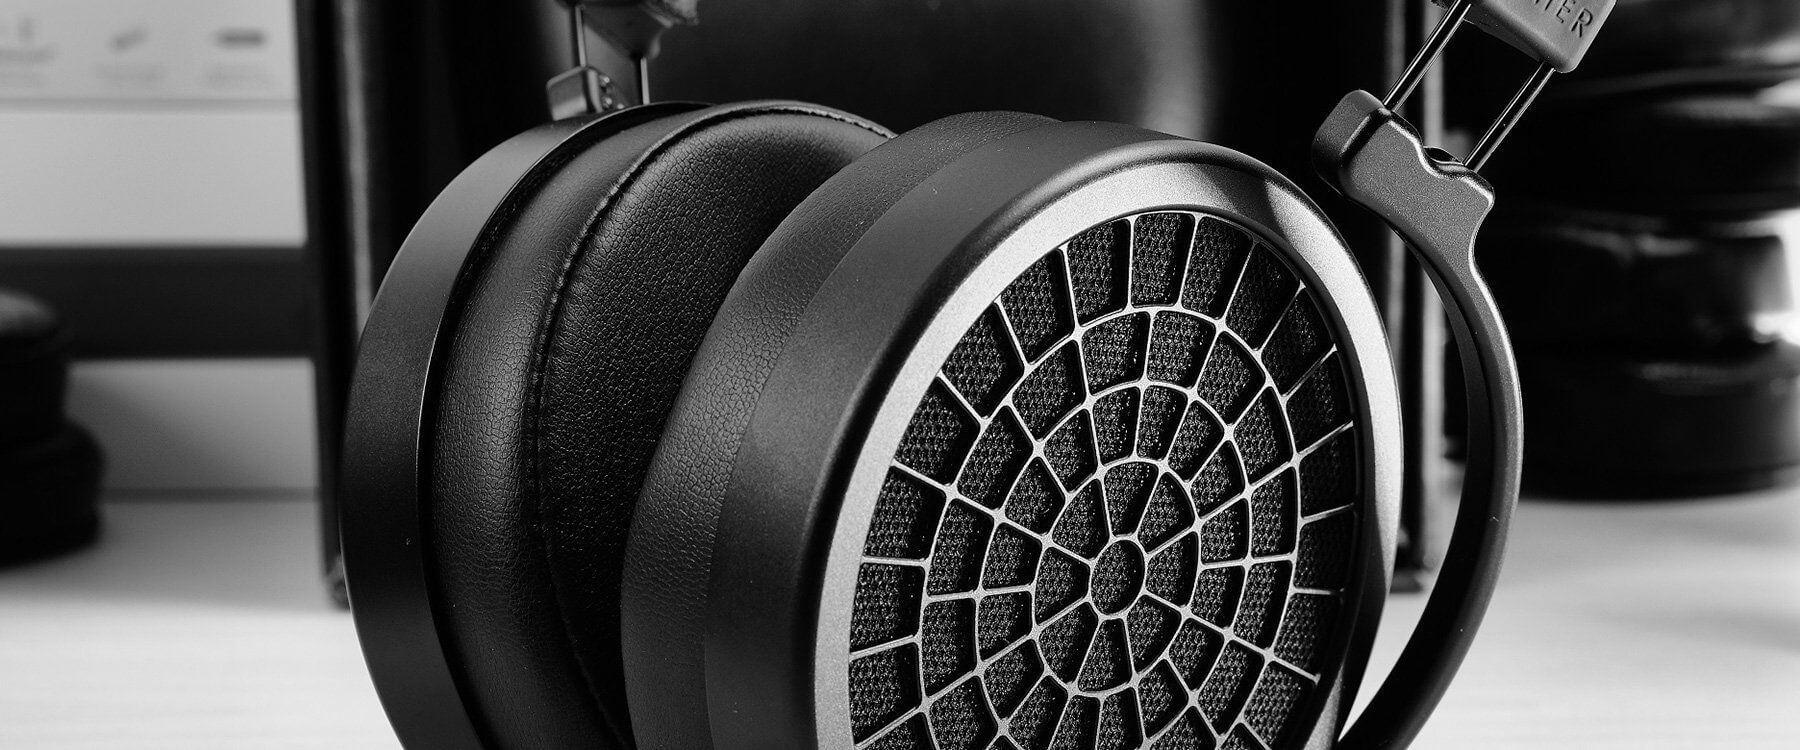 MrSpeakers Ether 2 - Ultra-Light Open-Back Planar Headphone - Review